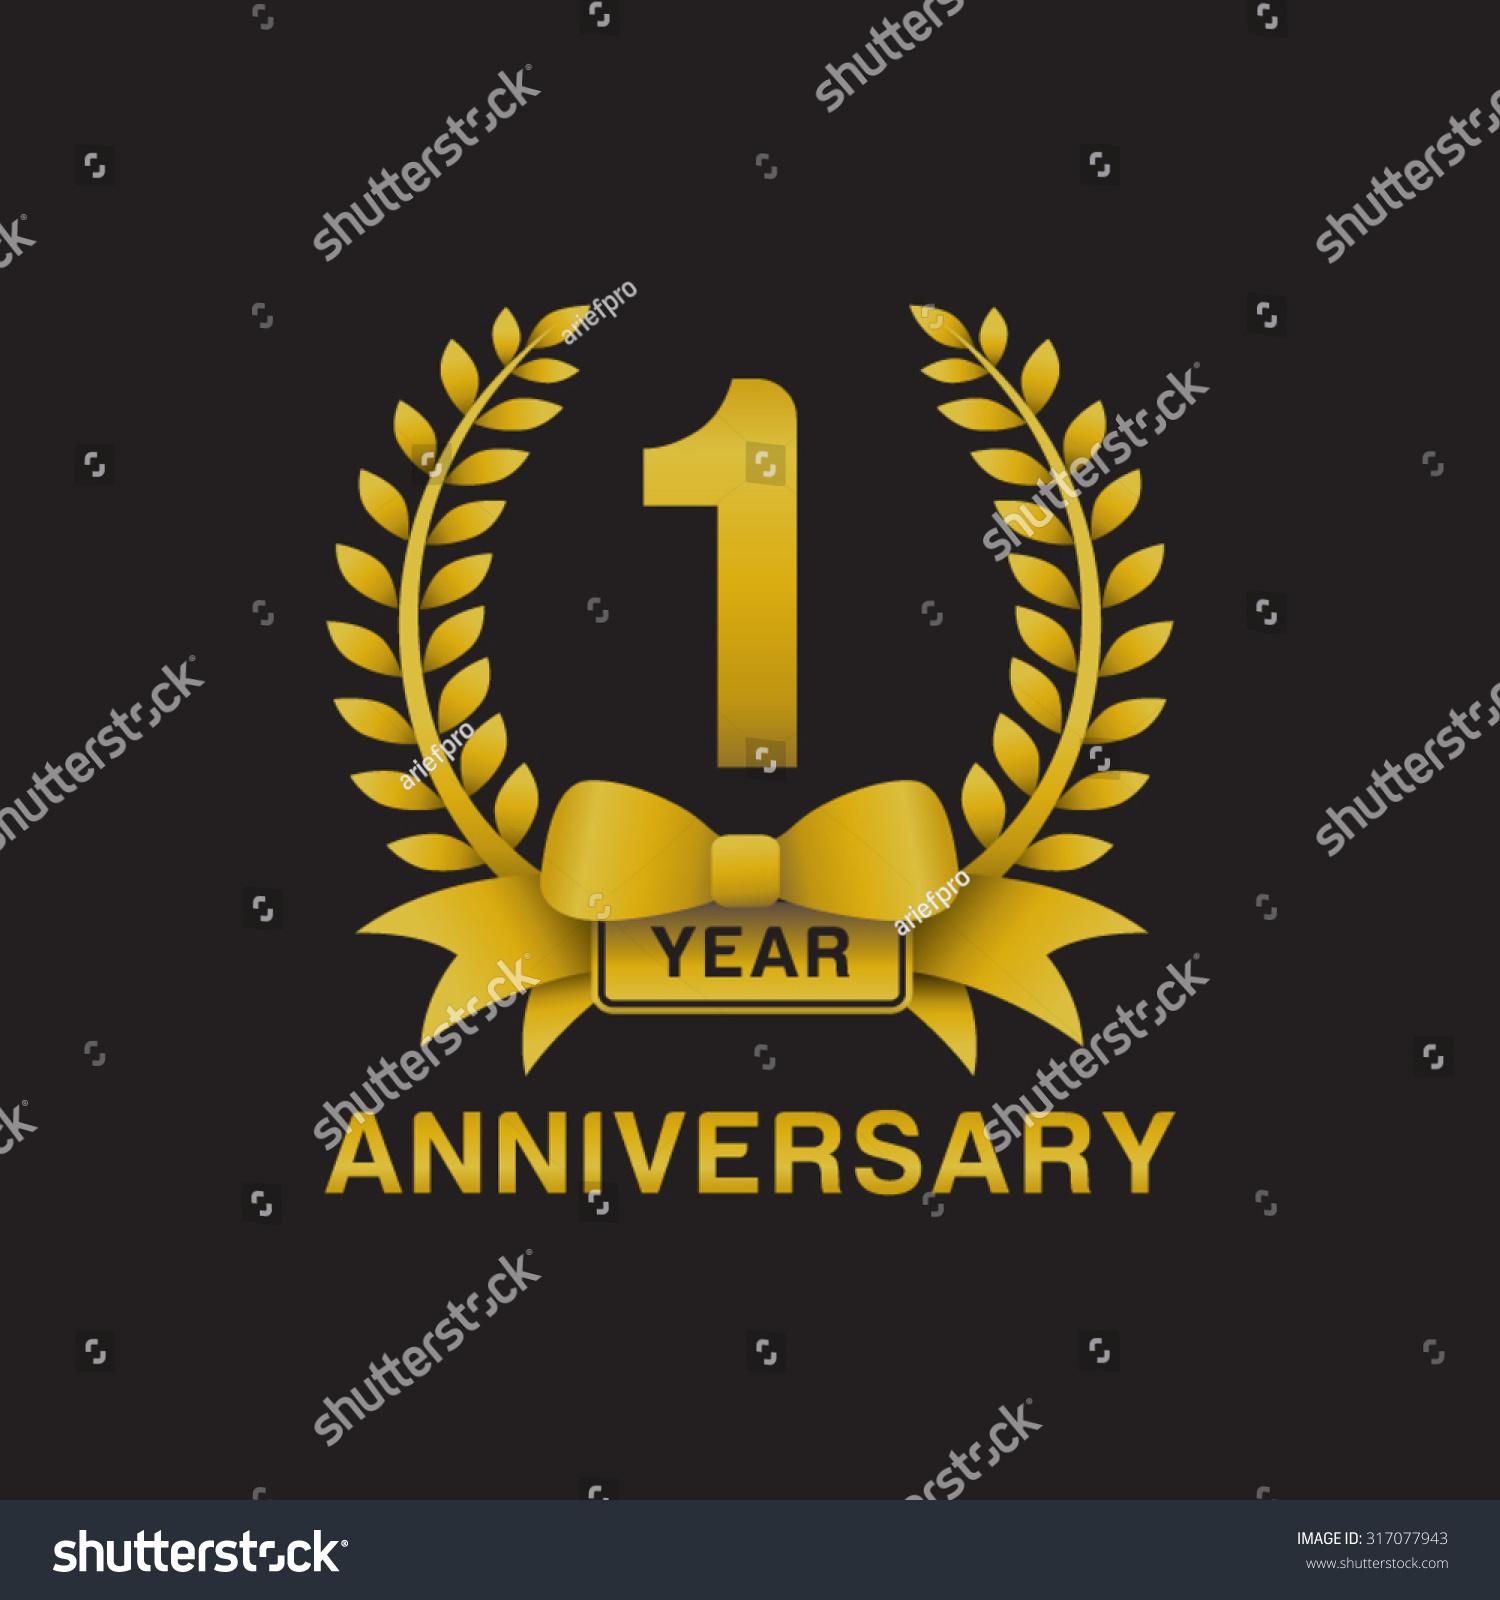 1st Anniversary Golden Wreath Logo Black Background Stock ...